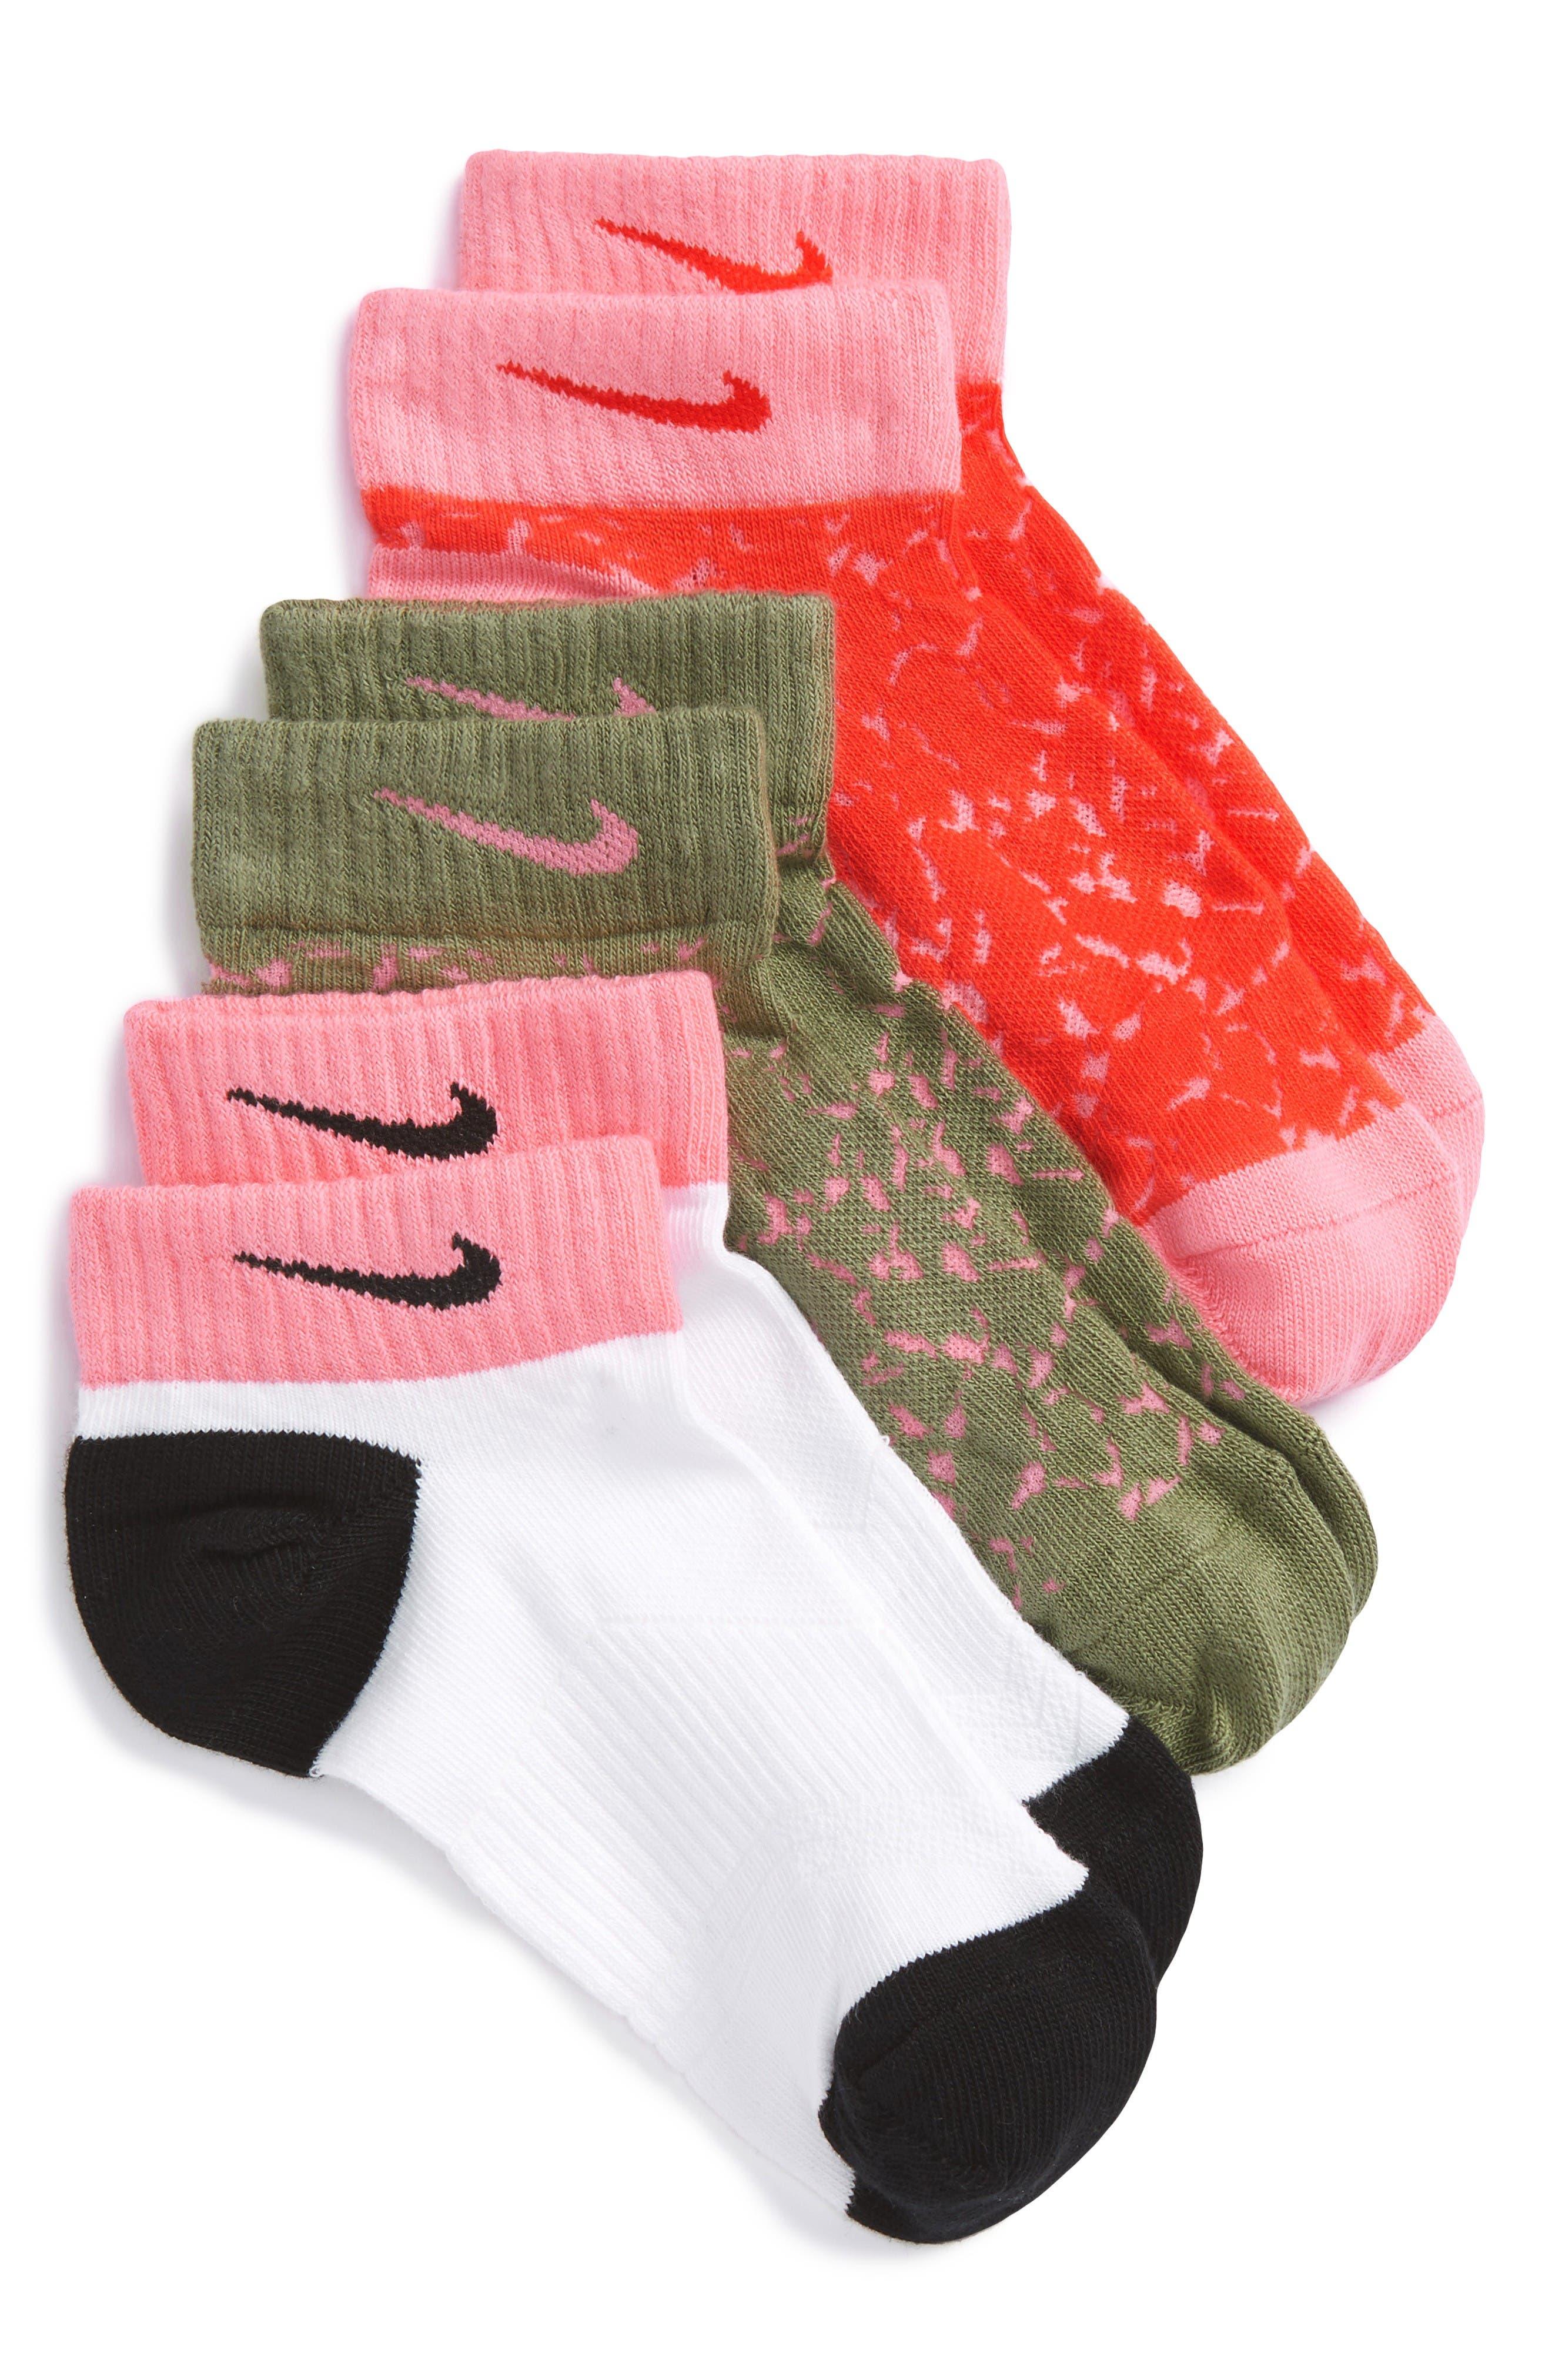 Main Image - Nike Low Cut Graphic Socks (Kids)